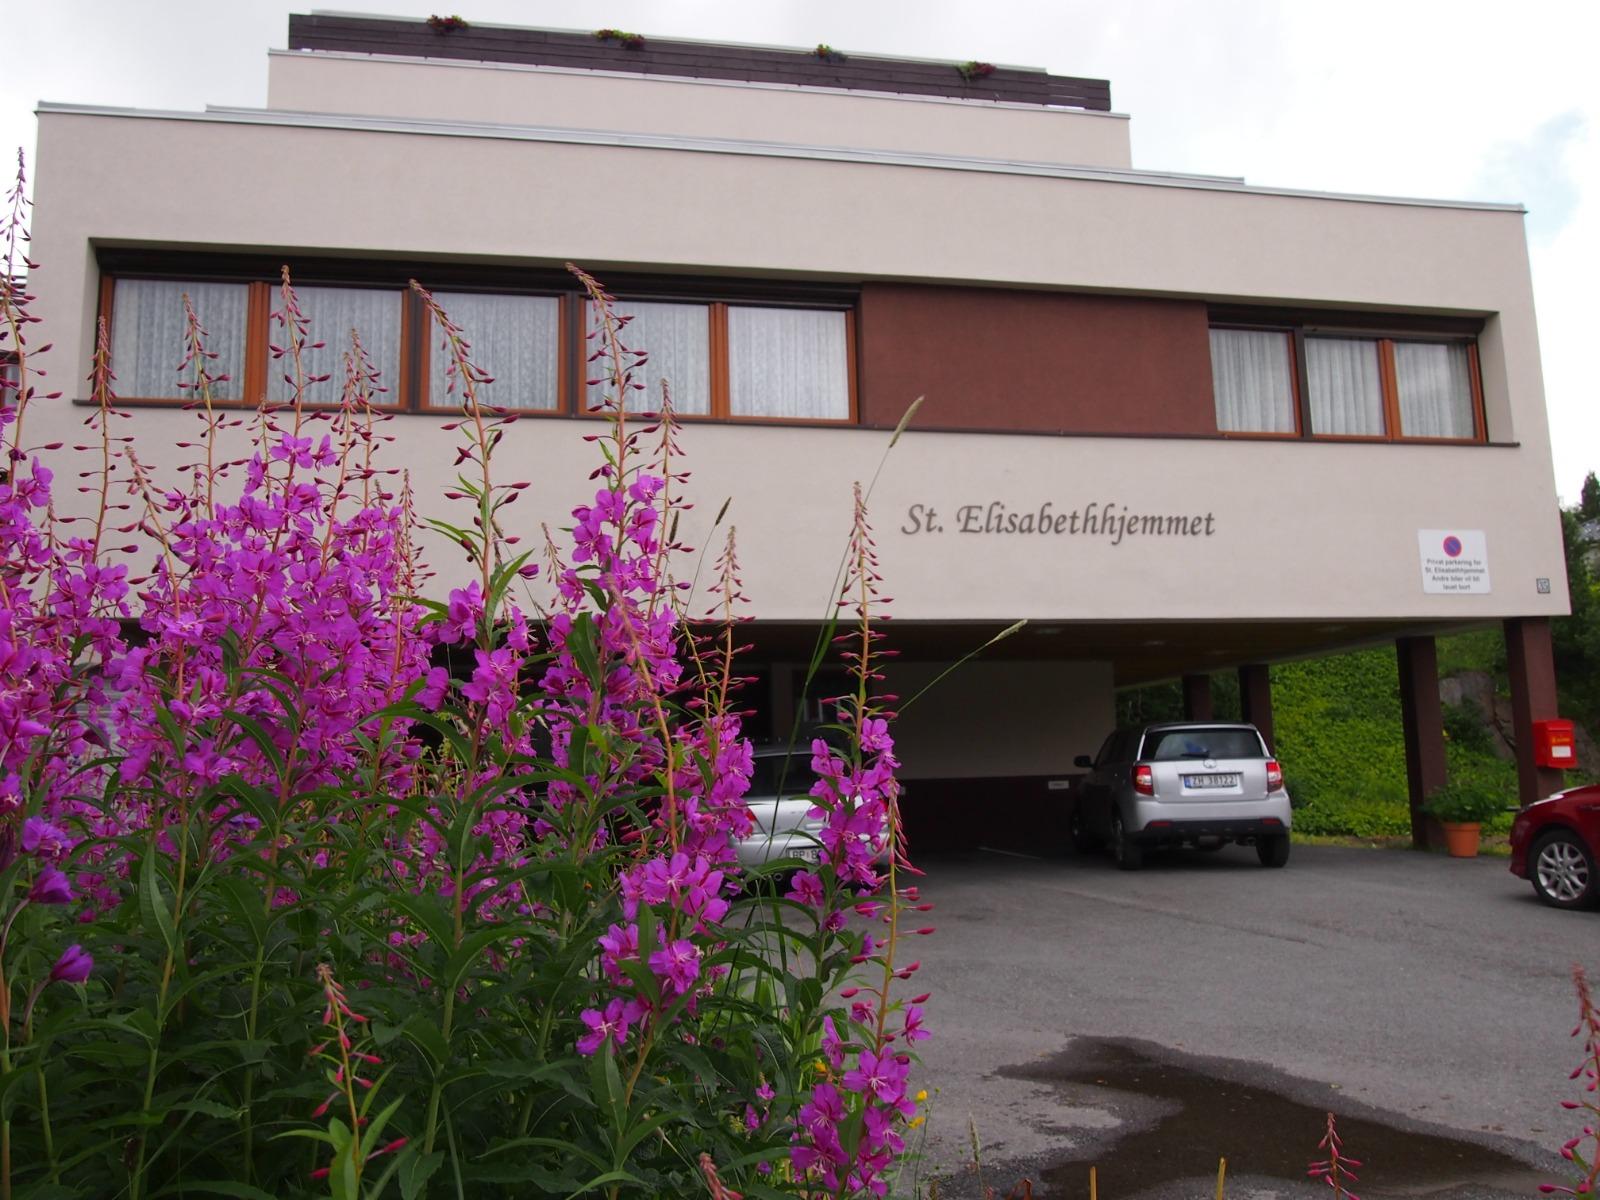 St Elisabethhjemmet i Balsfjordgata 35 som et aldershjem fra 1976